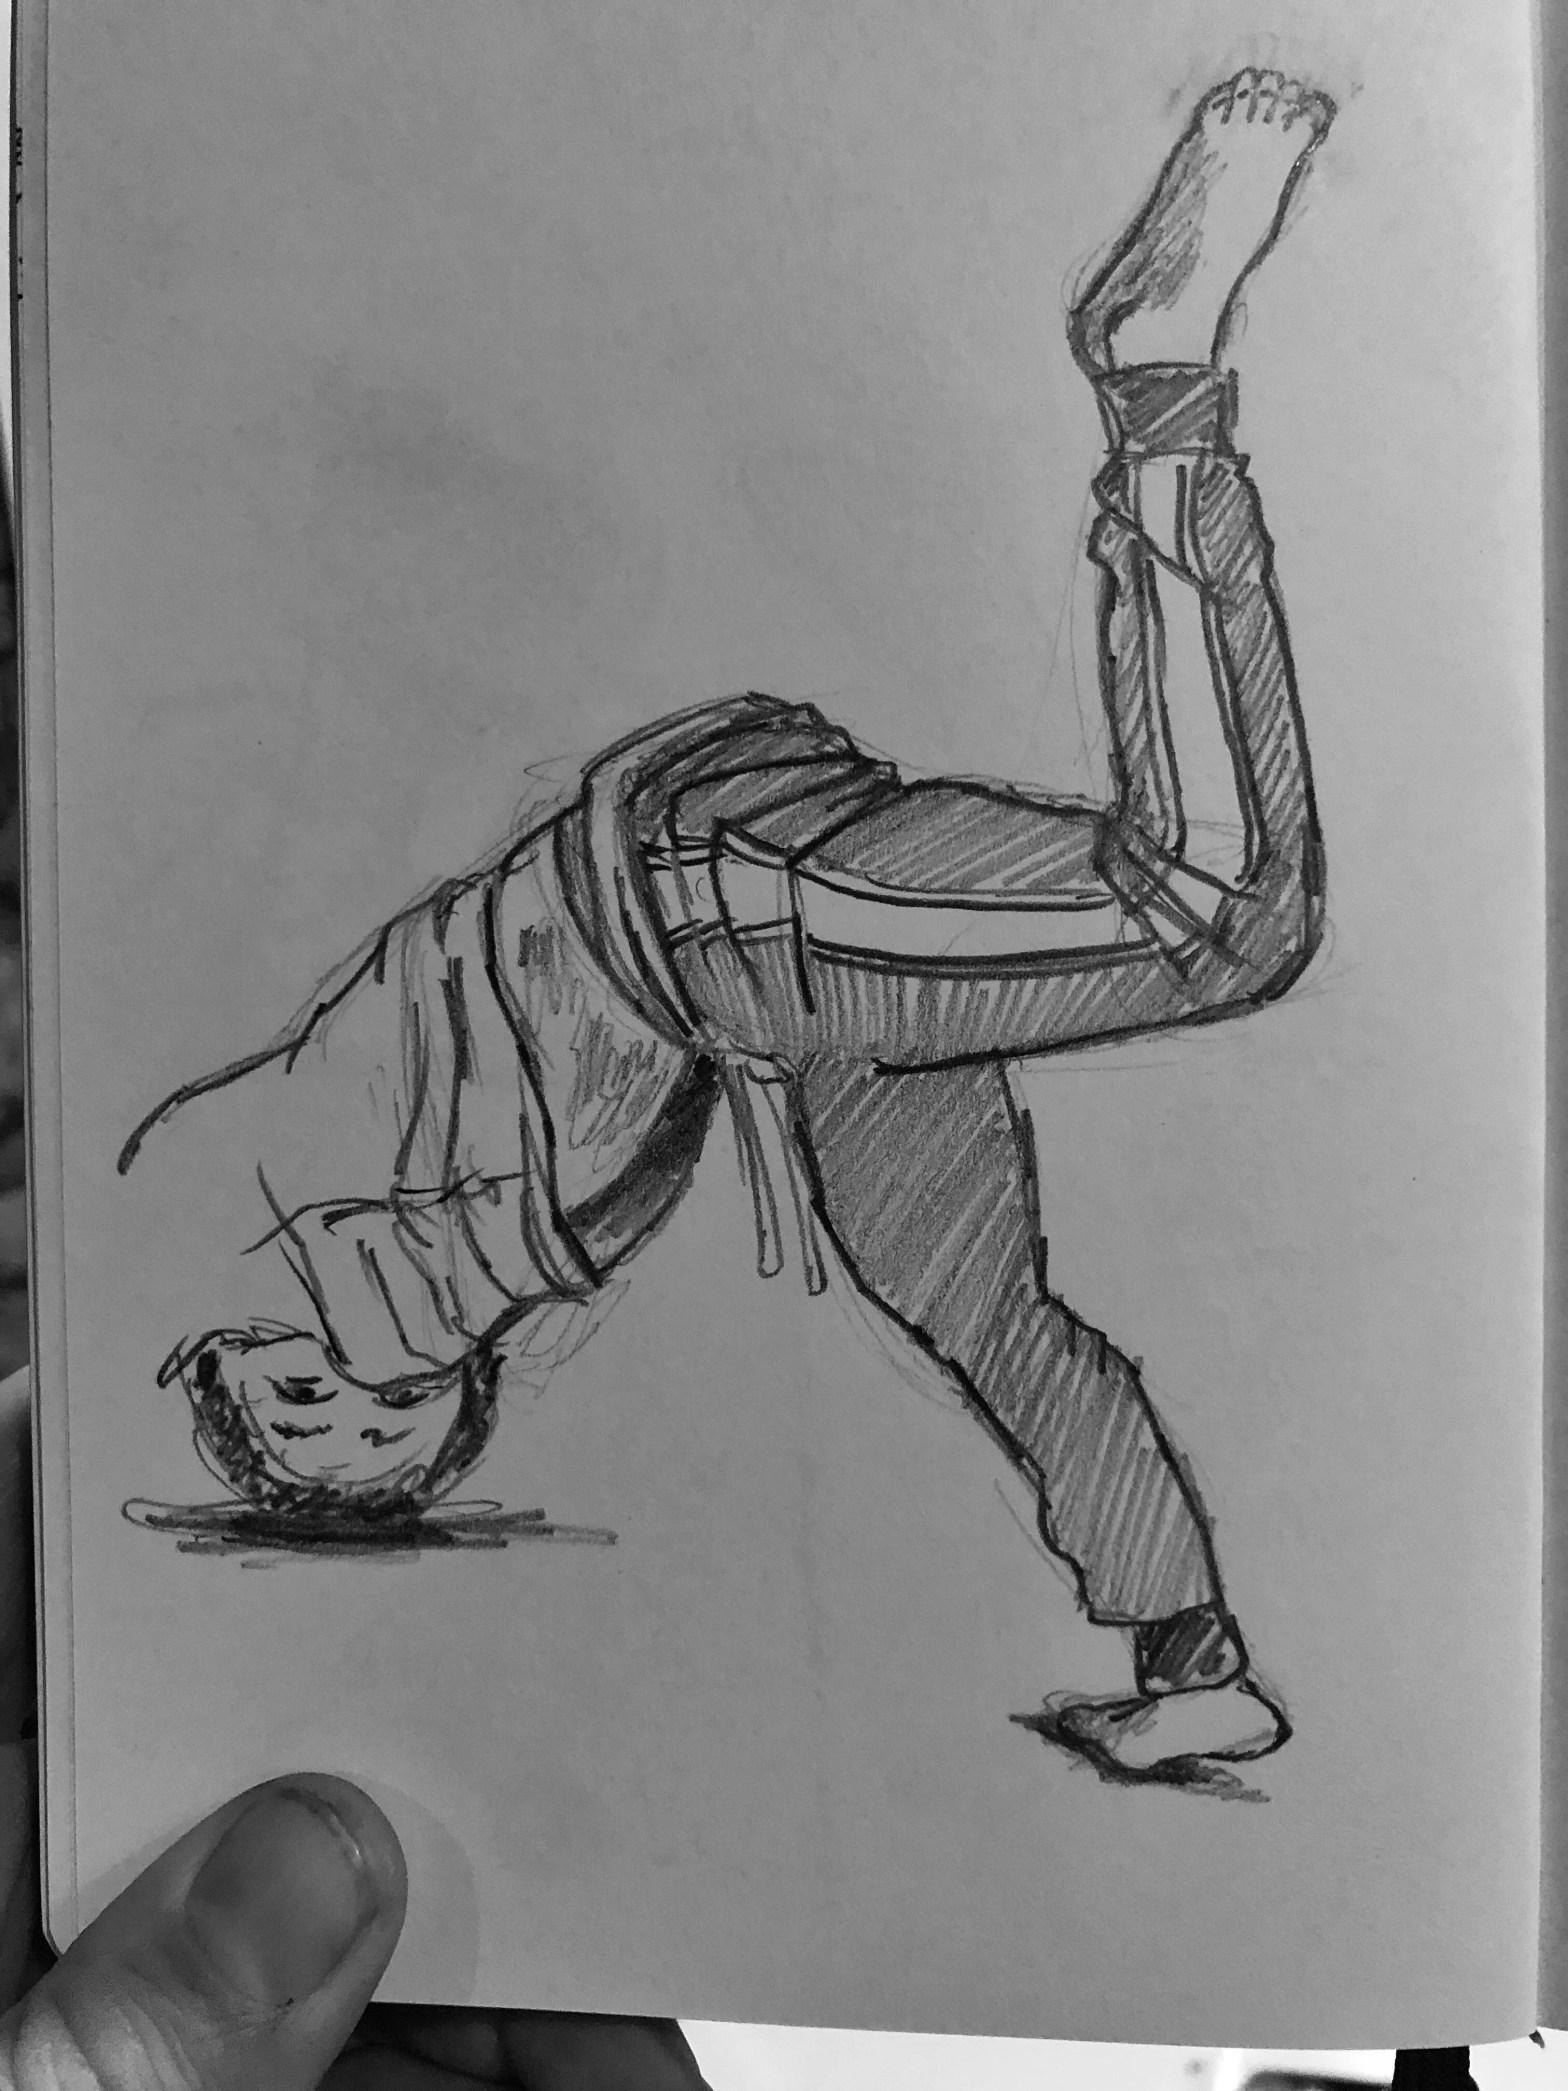 Boy doing a break dance move. Pencil drawing.